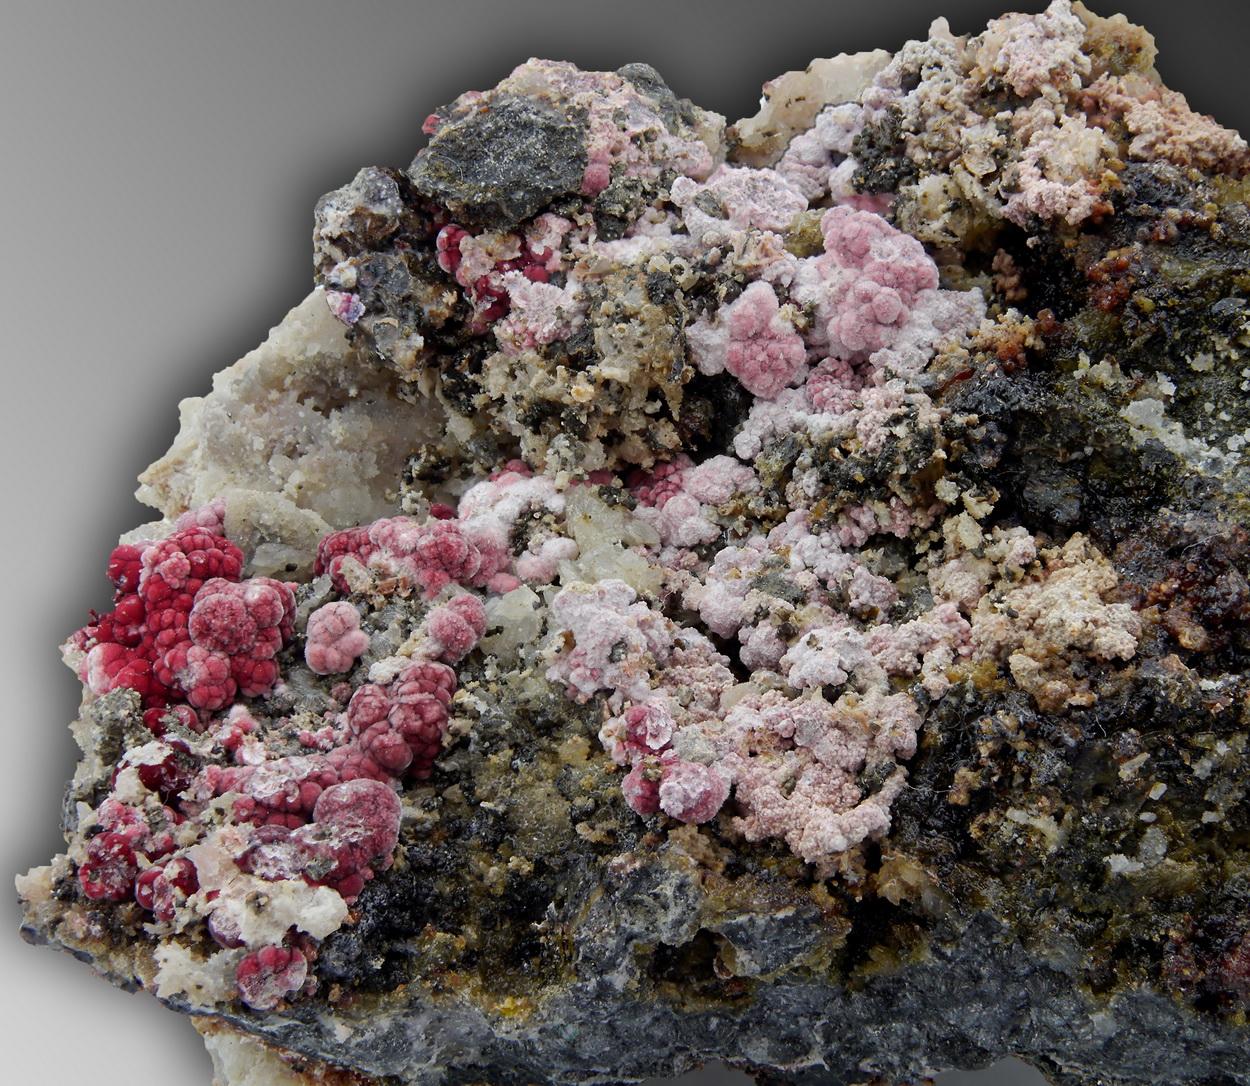 Erythrite On Quartz